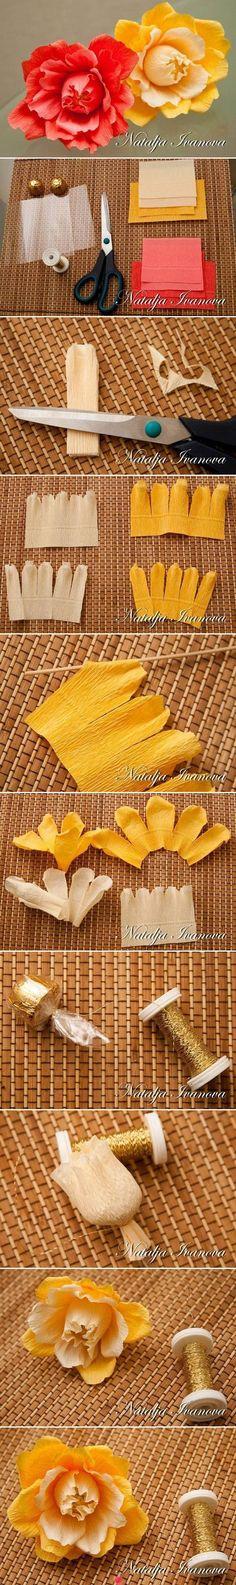 paper crepe flower